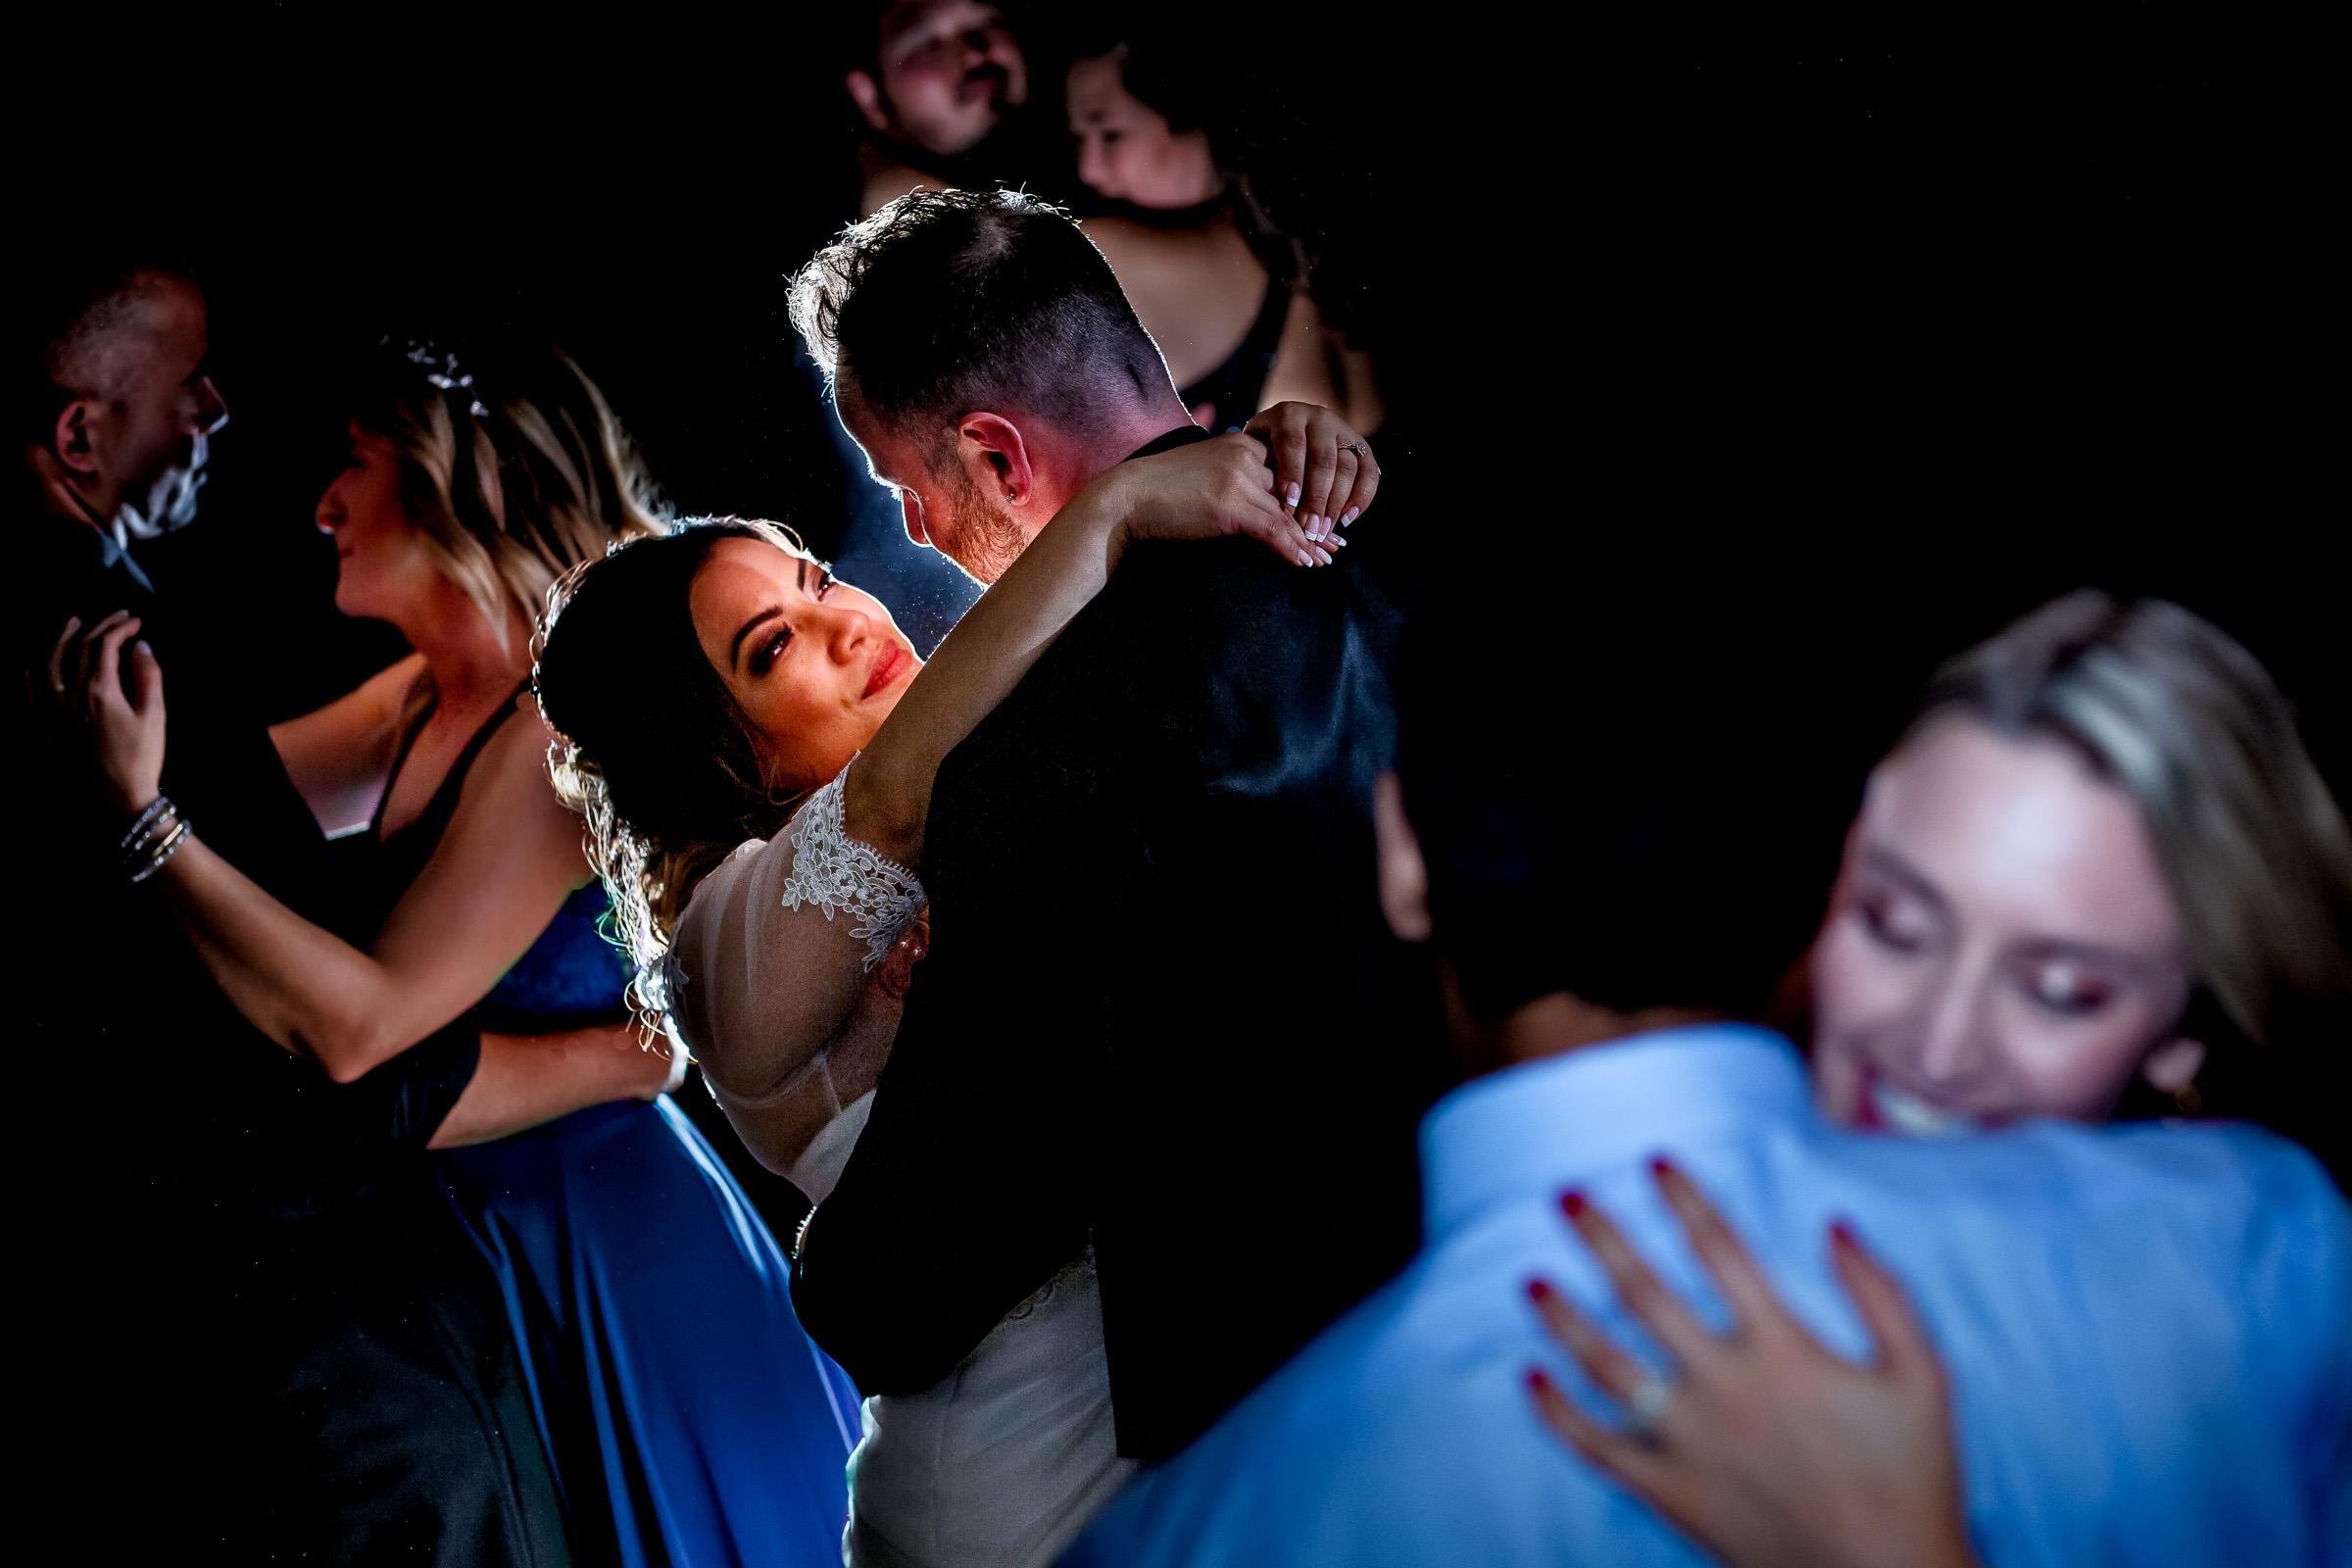 Timberline Lodge wedding spotlight on couple dancing - photo by JOS & TREE